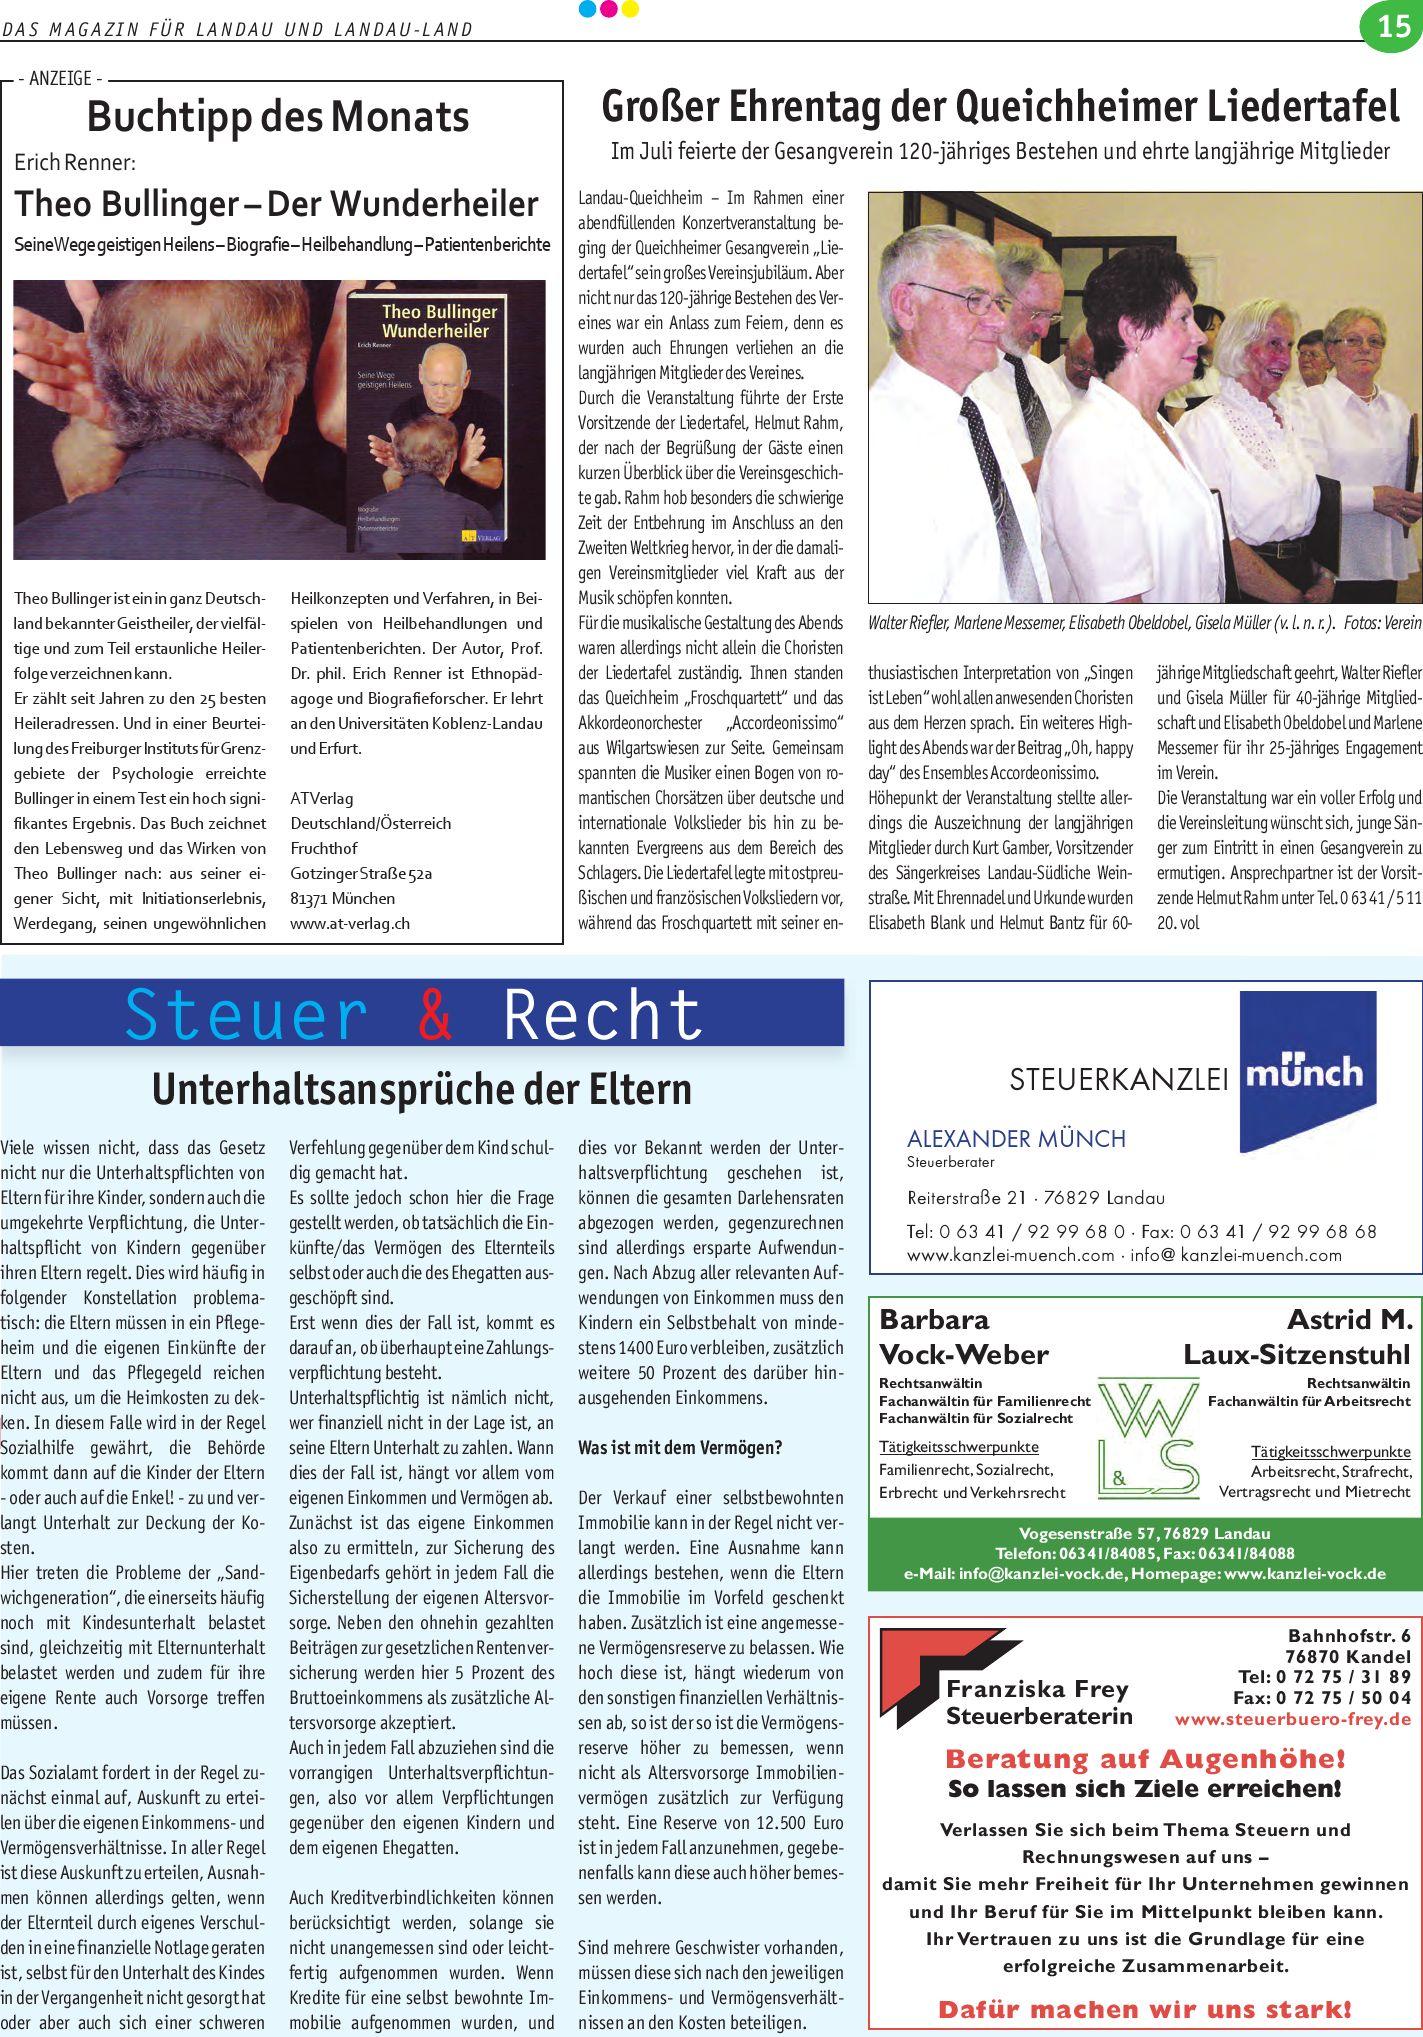 Die Lokale Ausgabe Landau 07 2009 By Sudpfalz Verlag Issuu